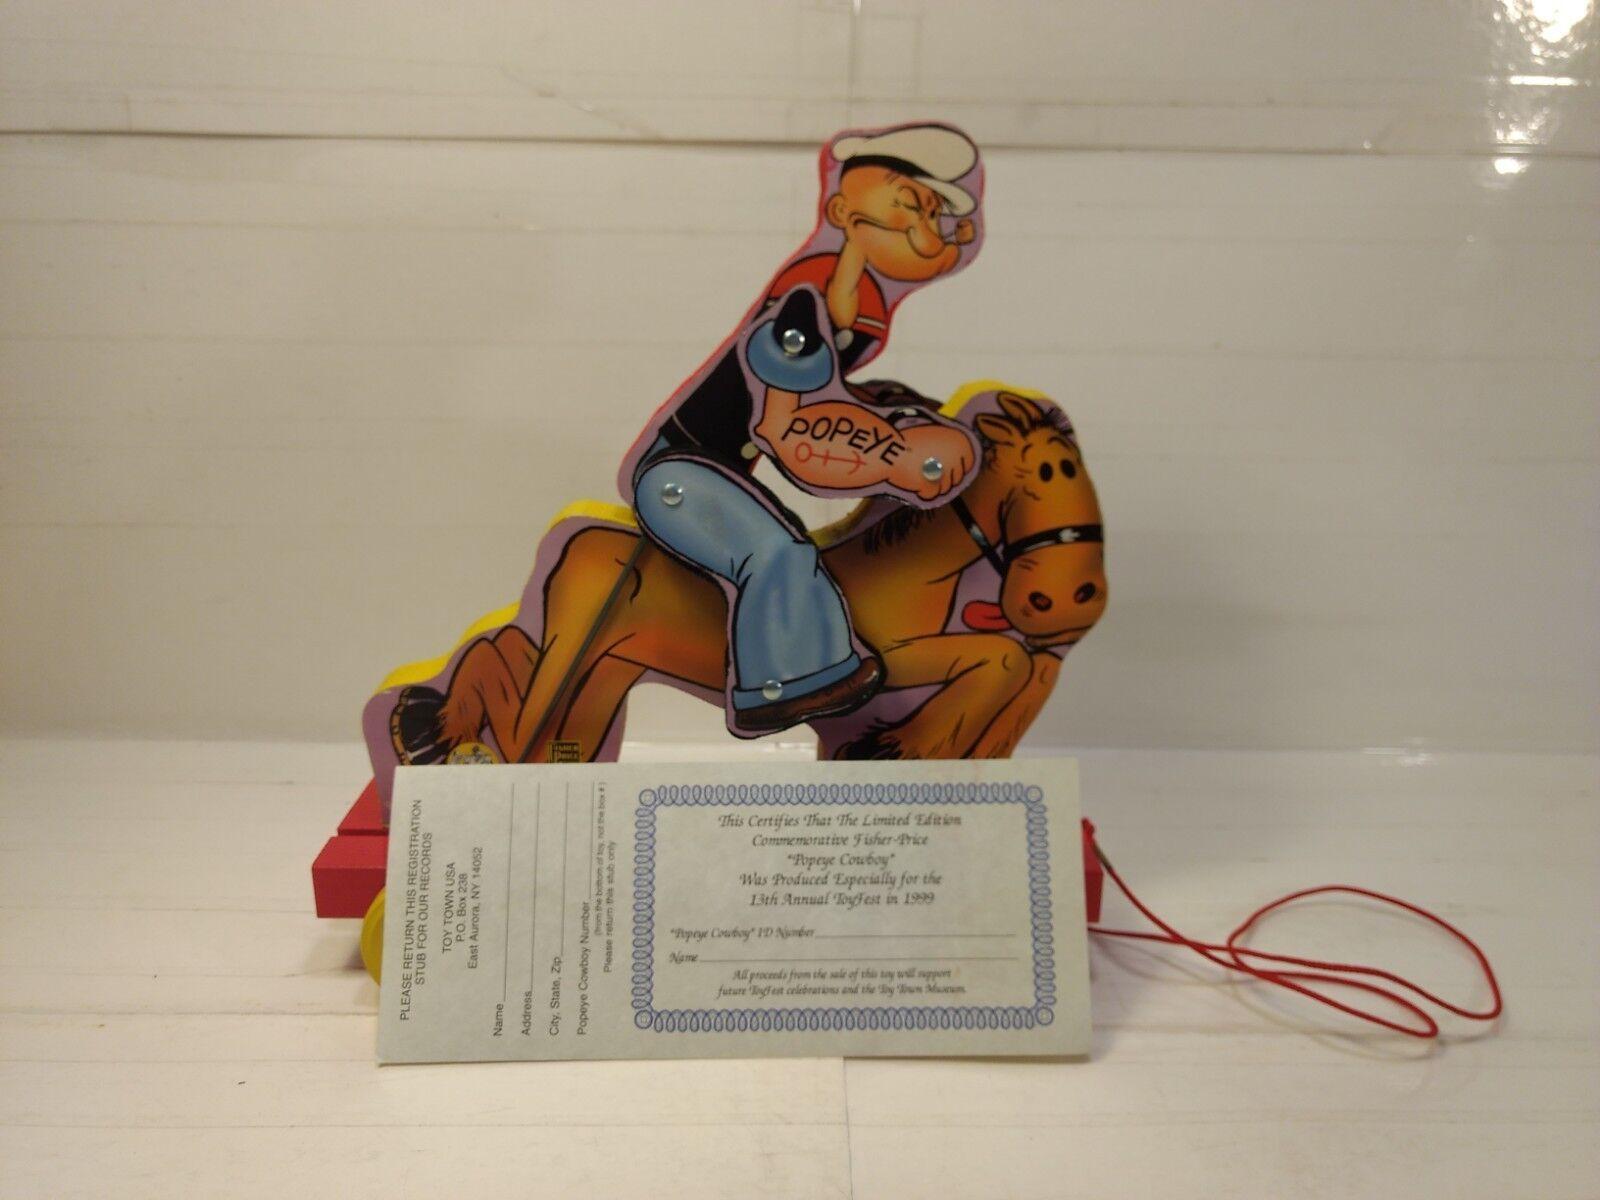 990705 Fisher 1999 Fest Toy Pull Cowboy Popeye